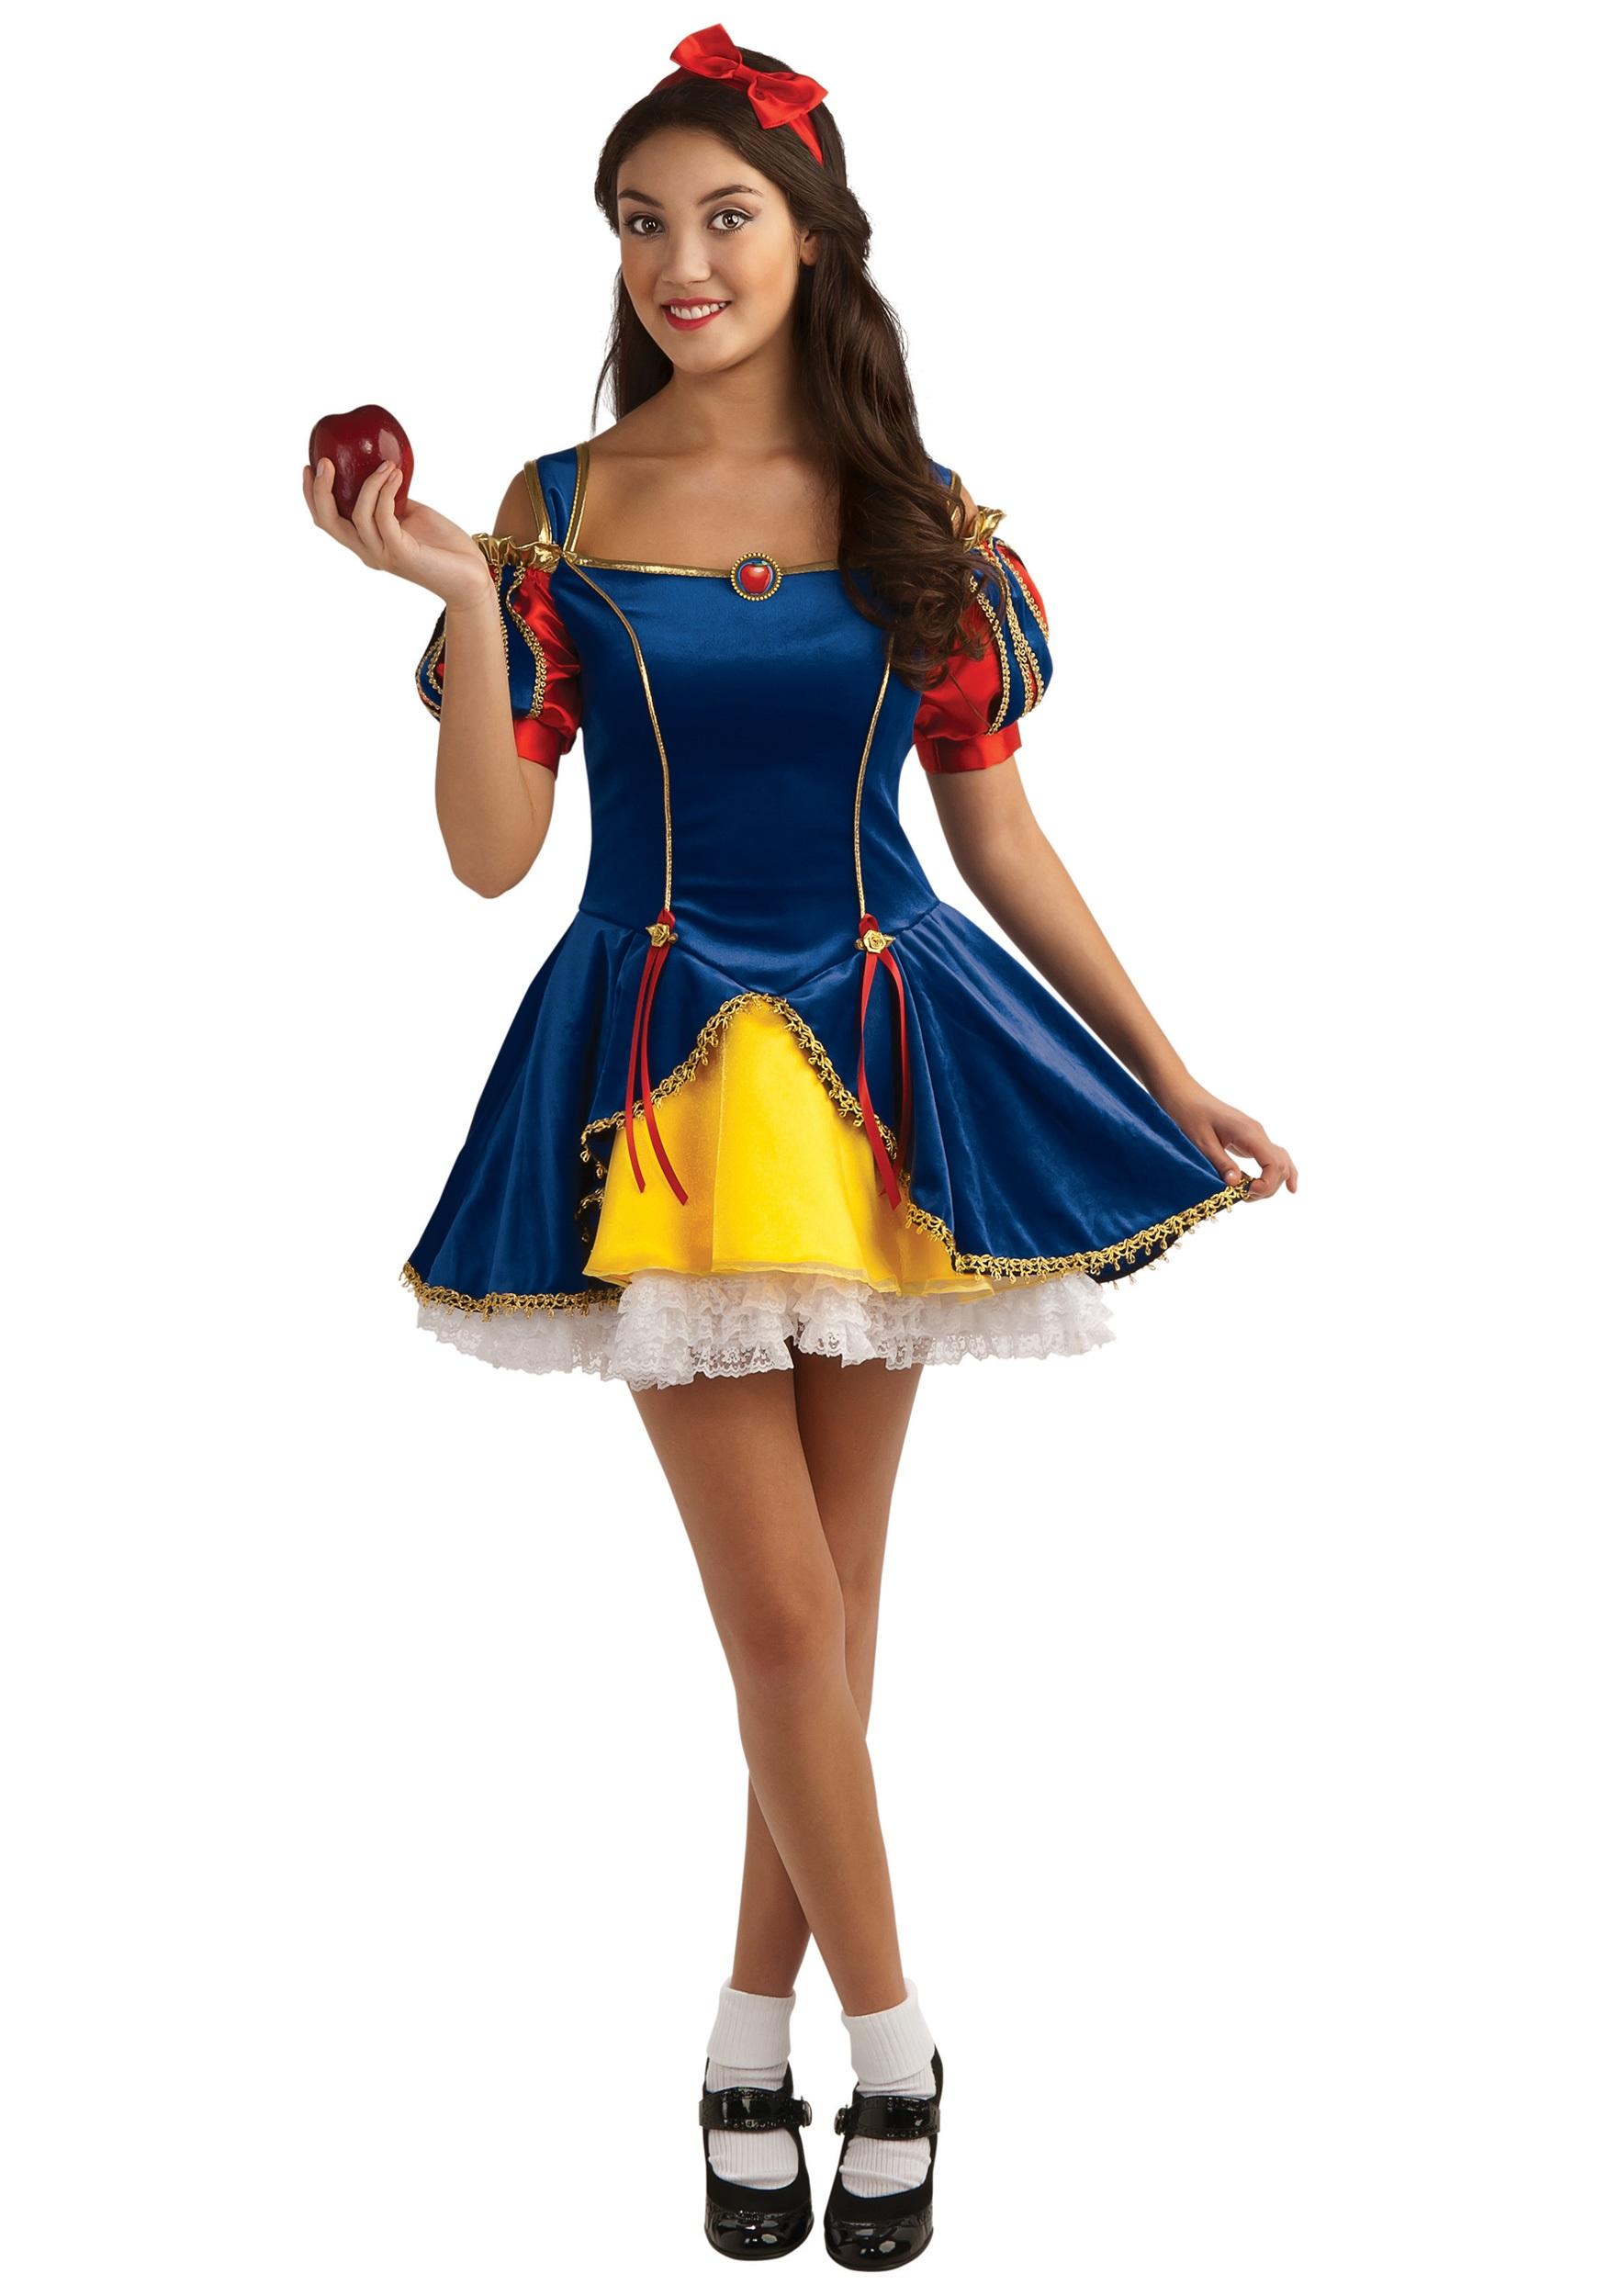 Machine fuck teens halloween costumes for girls